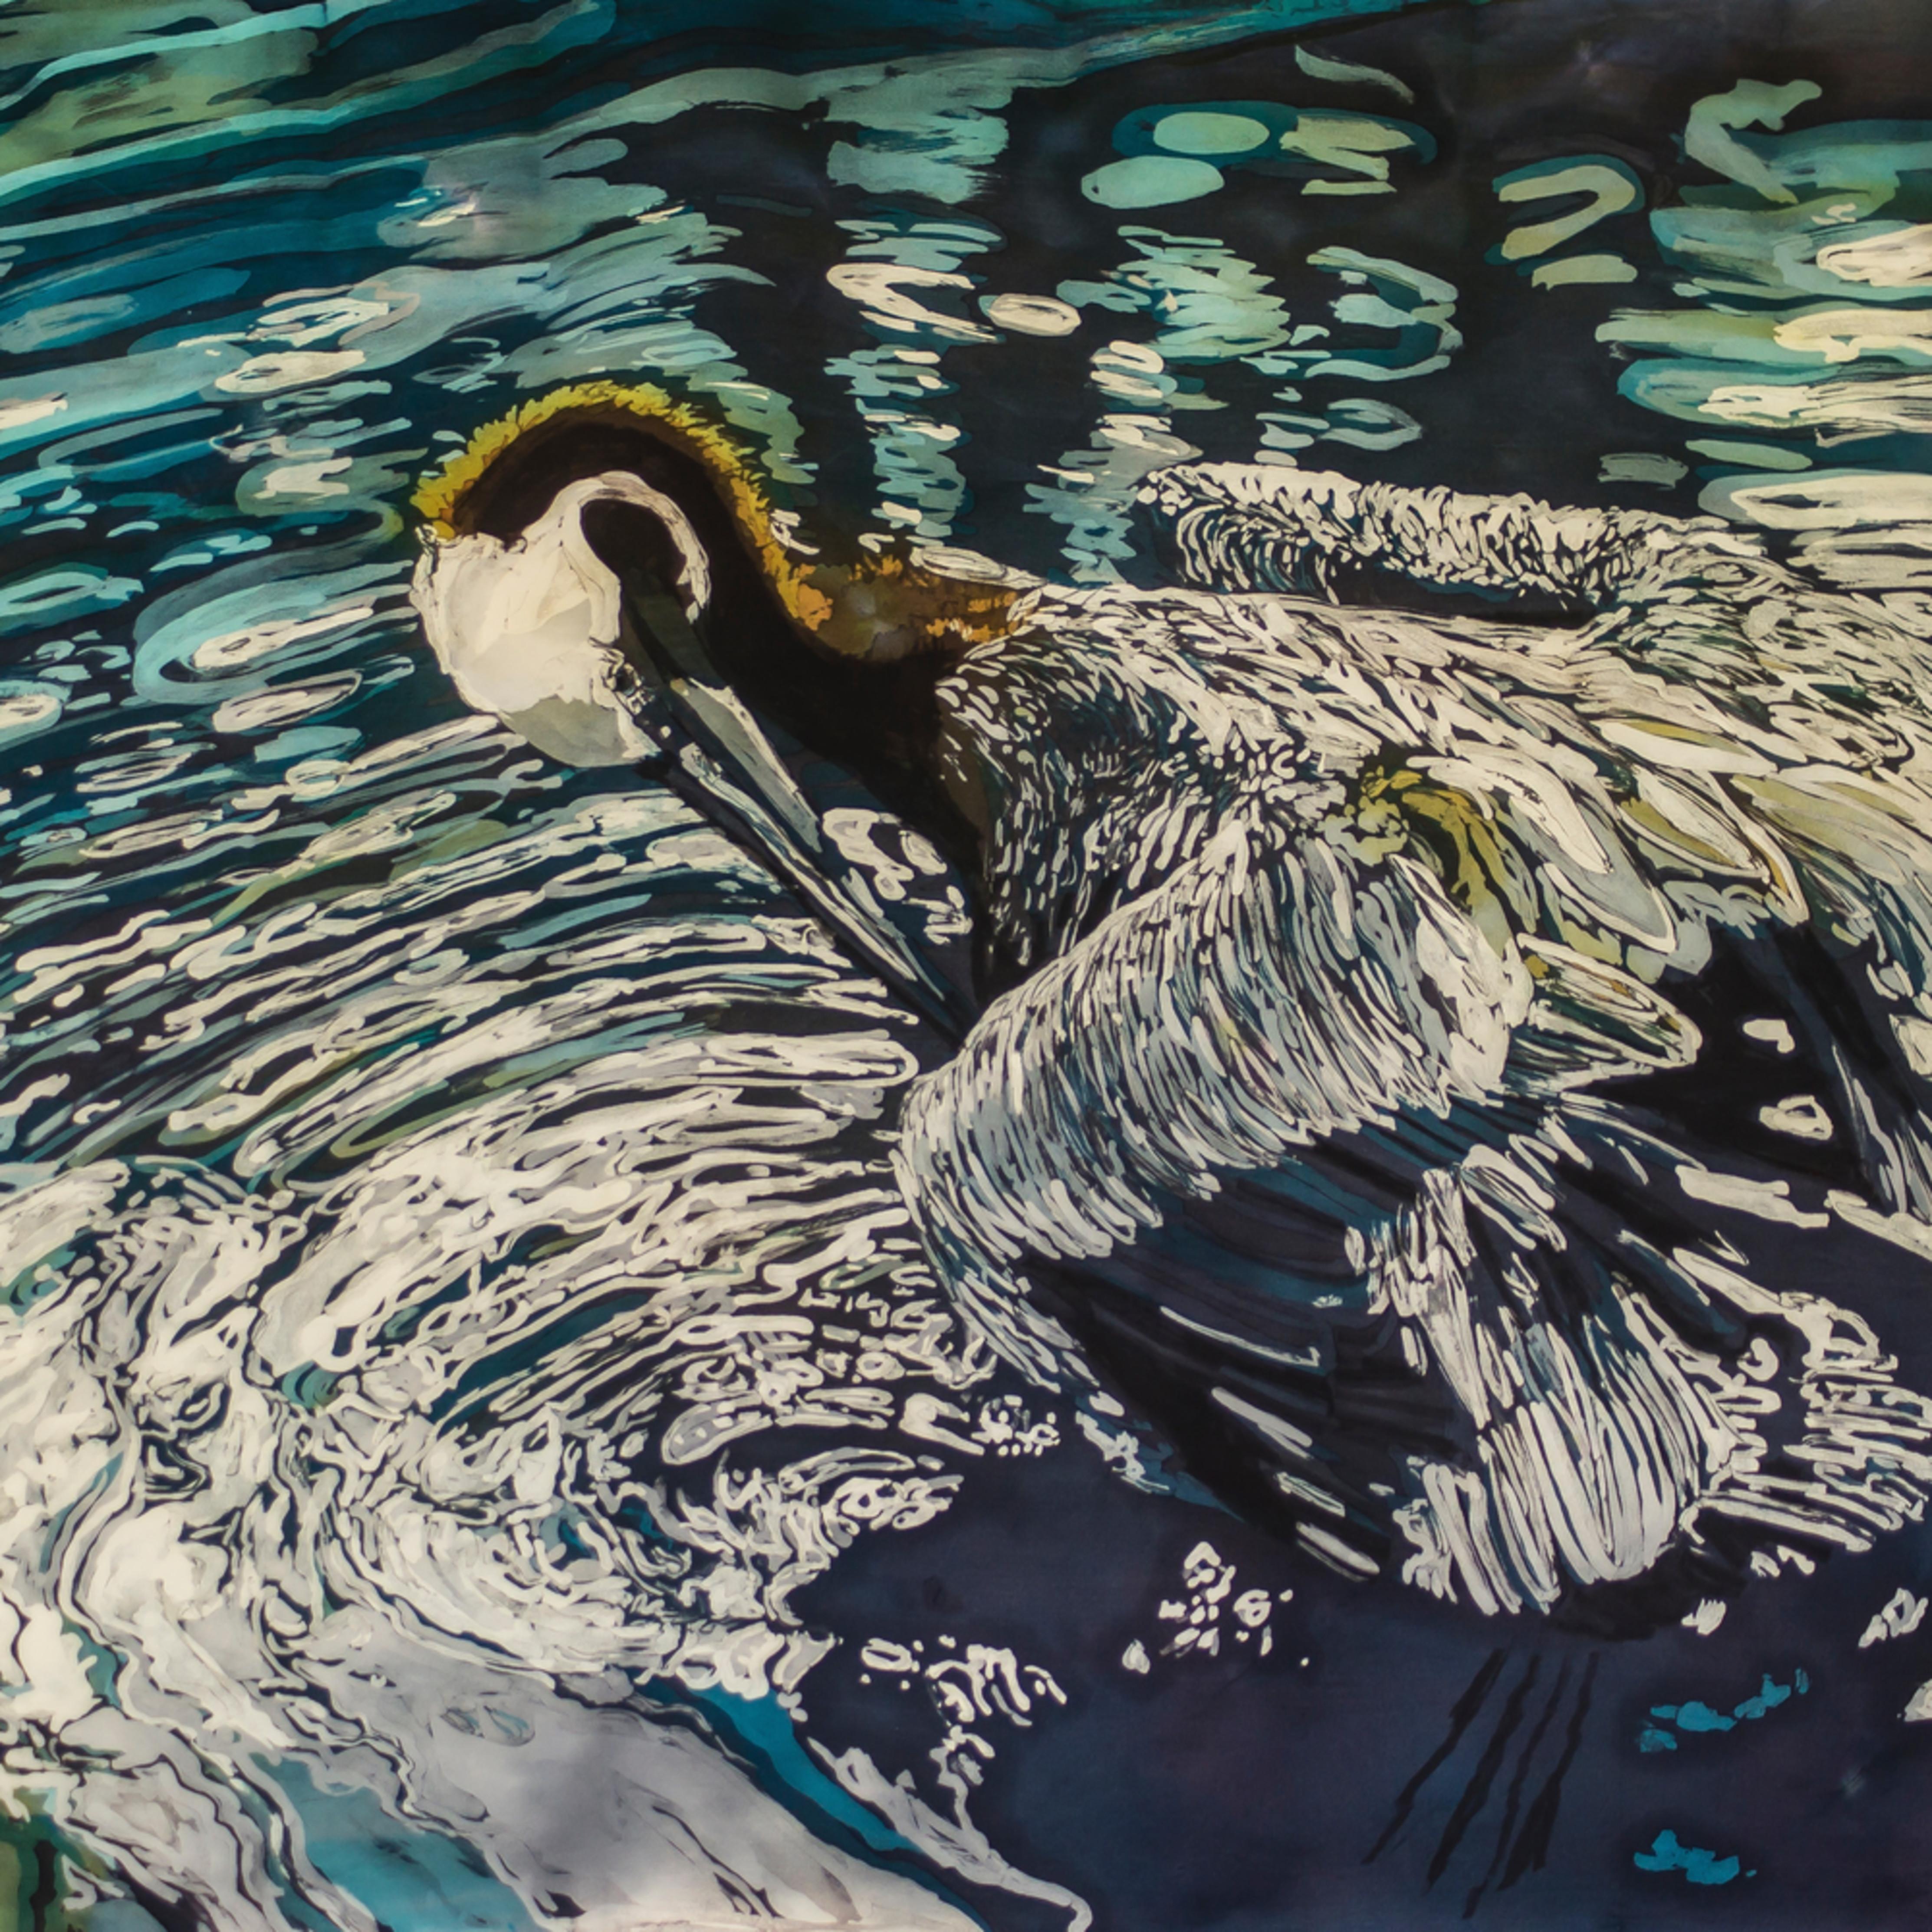 Mcg 130 muffy clark gill preening 2014 rozome on silk  uharw2